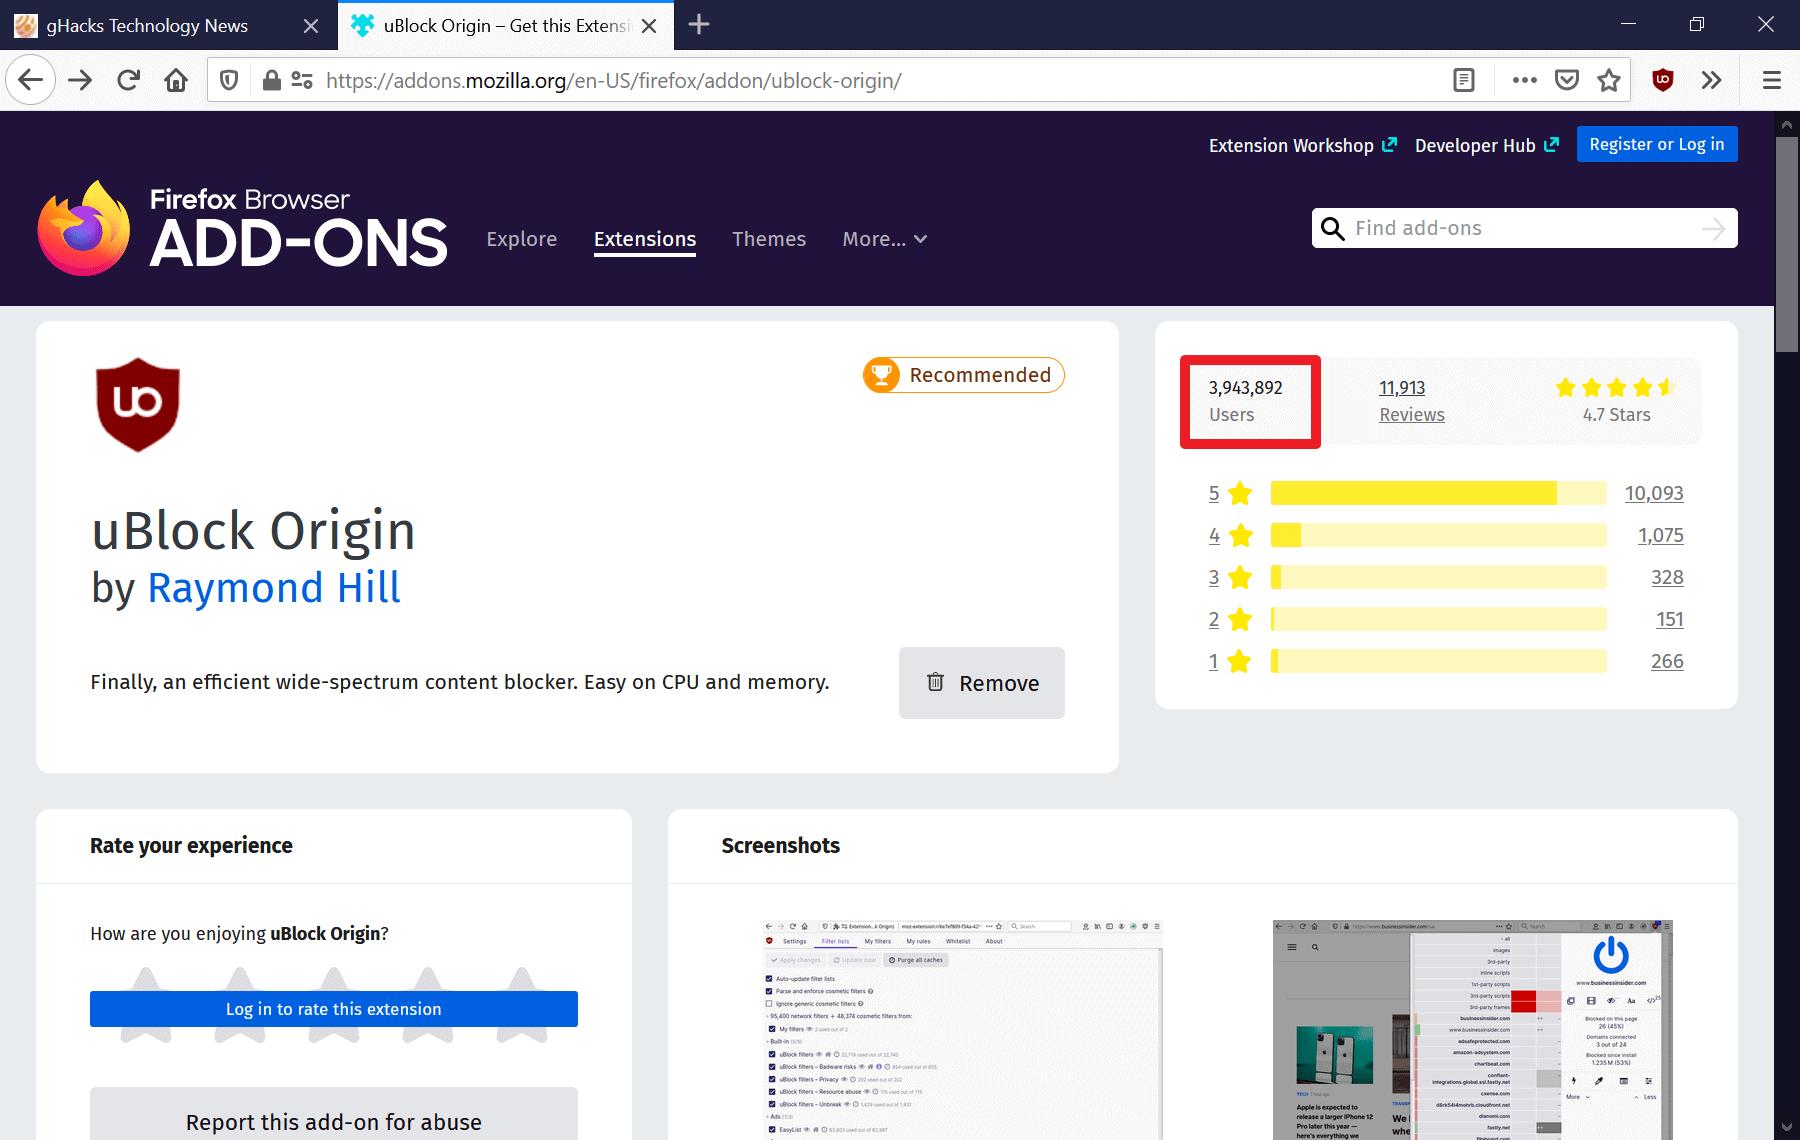 firefox add-ons users